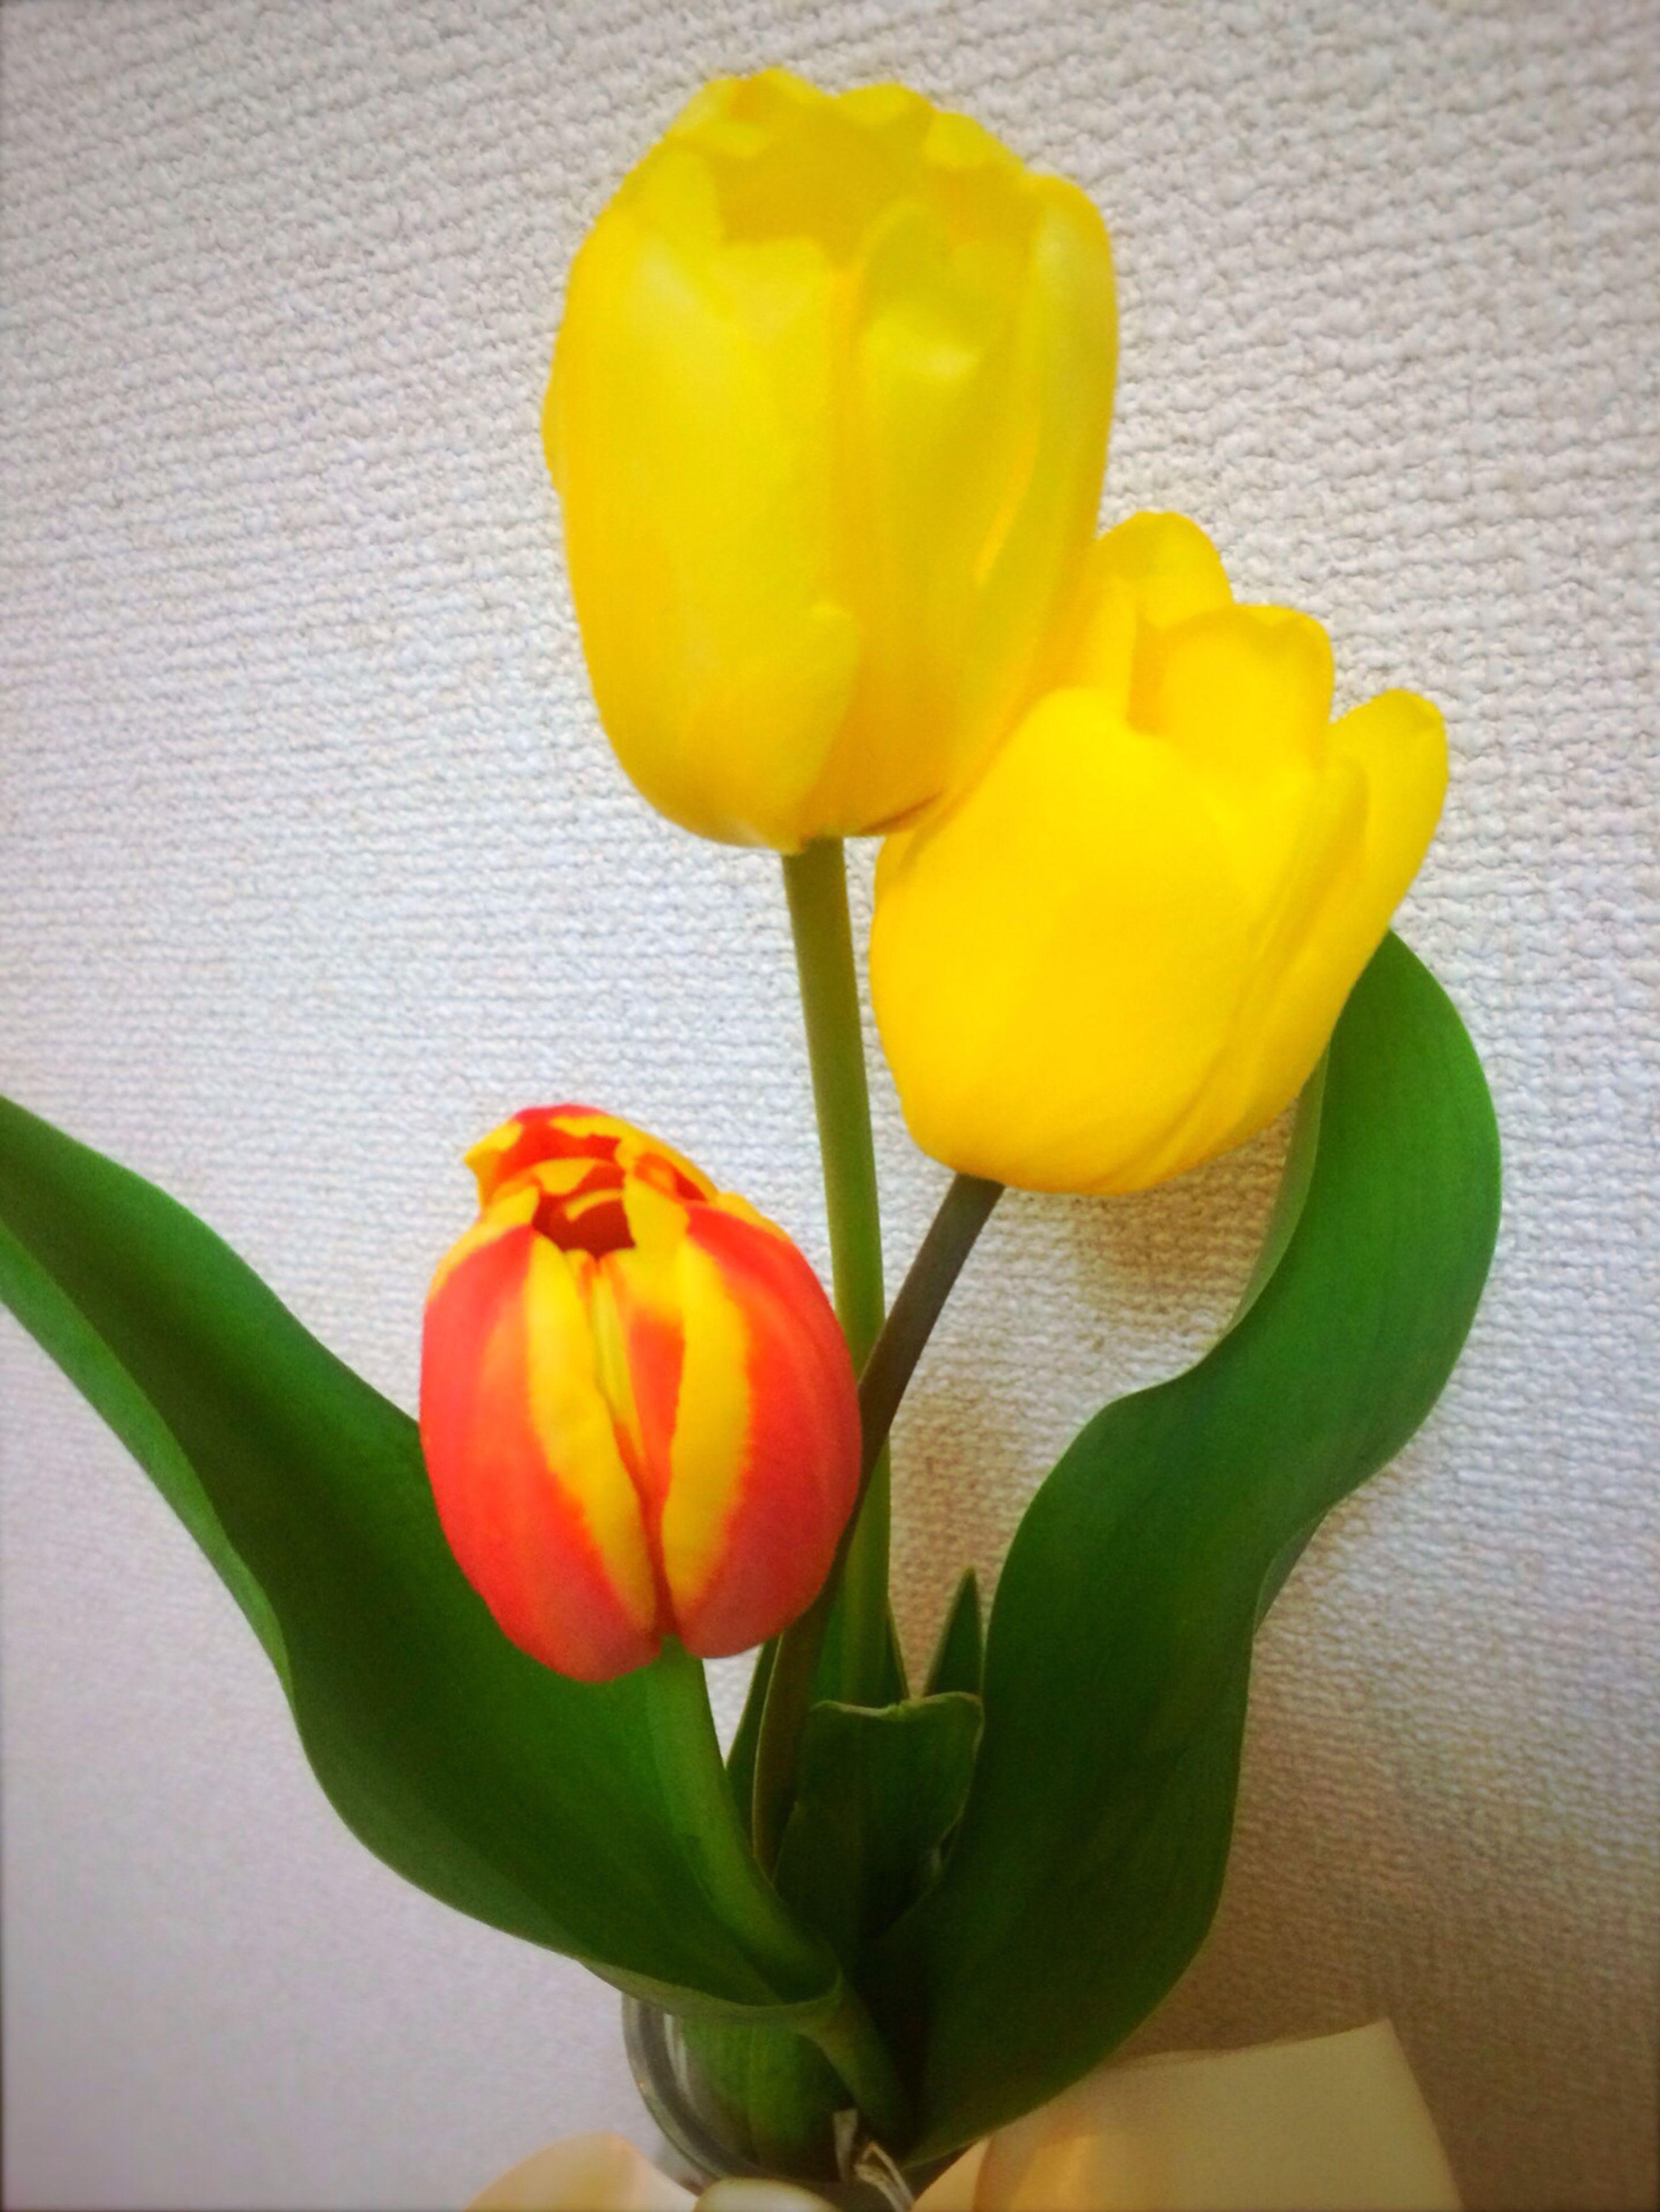 flower, freshness, yellow, petal, indoors, flower head, fragility, tulip, vase, wall - building feature, stem, close-up, home interior, flower arrangement, plant, leaf, orange color, beauty in nature, studio shot, growth